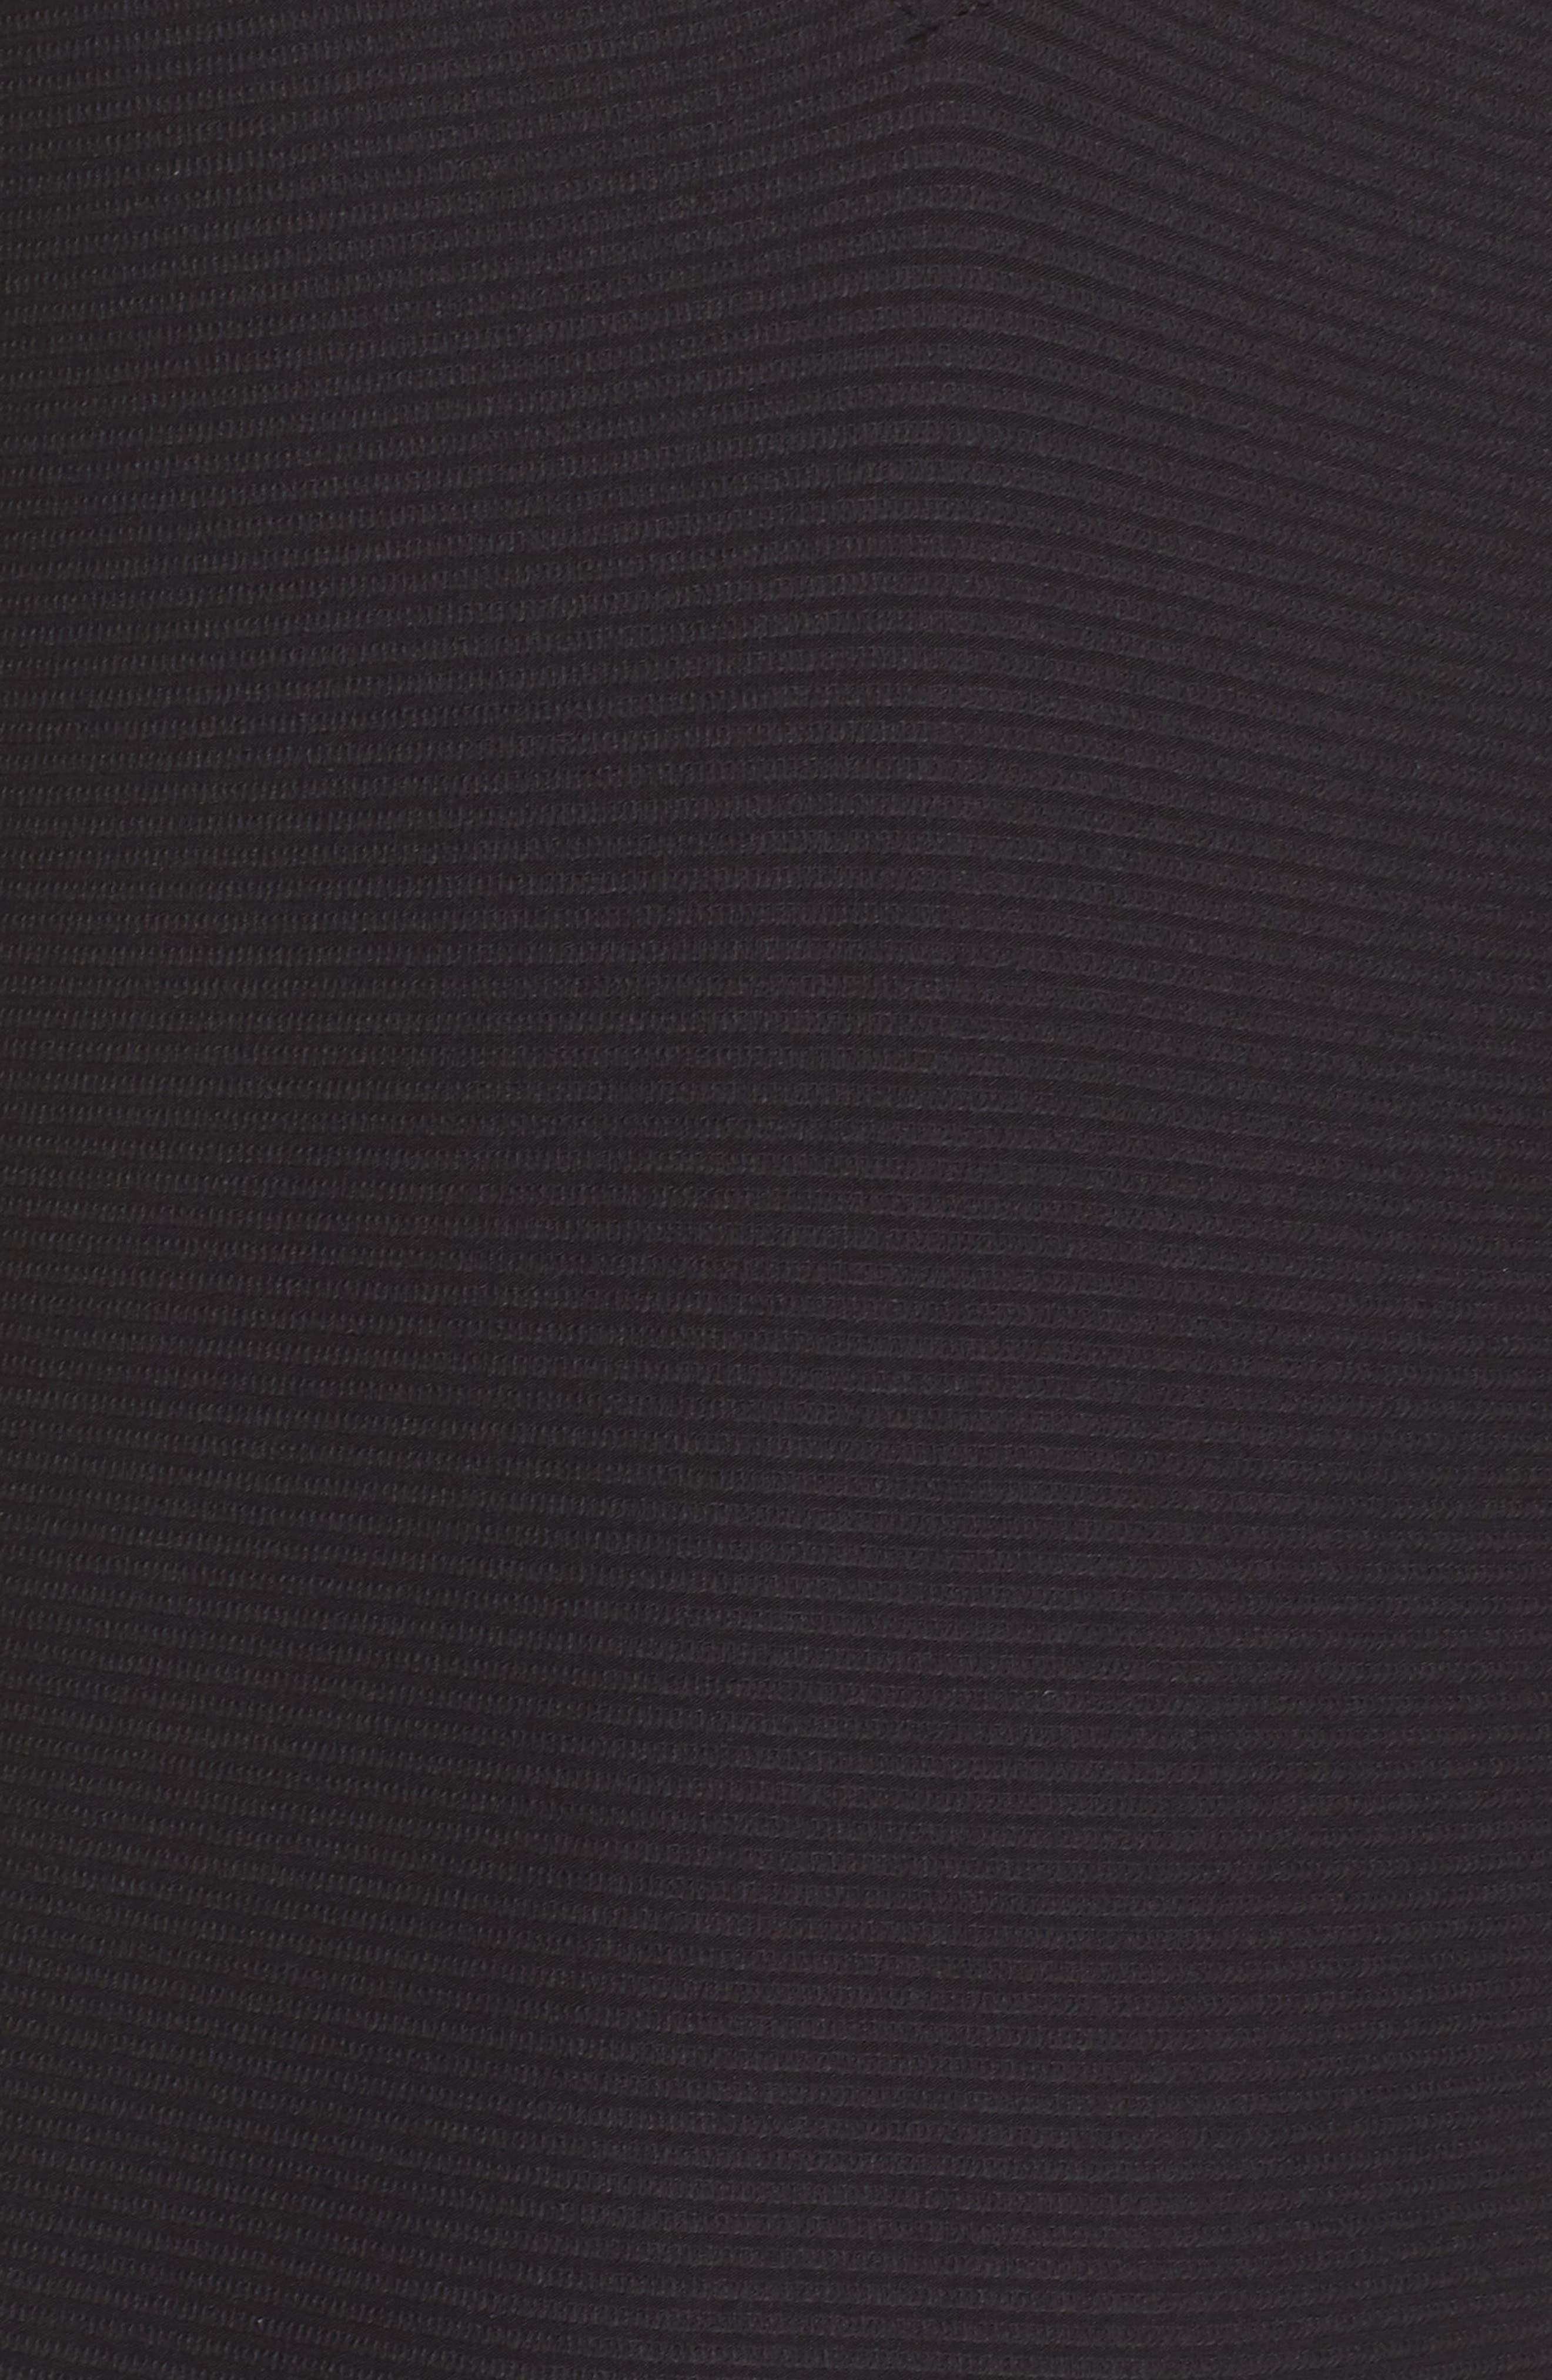 Tanlines One-Piece Swimsuit,                             Alternate thumbnail 5, color,                             Black Sands